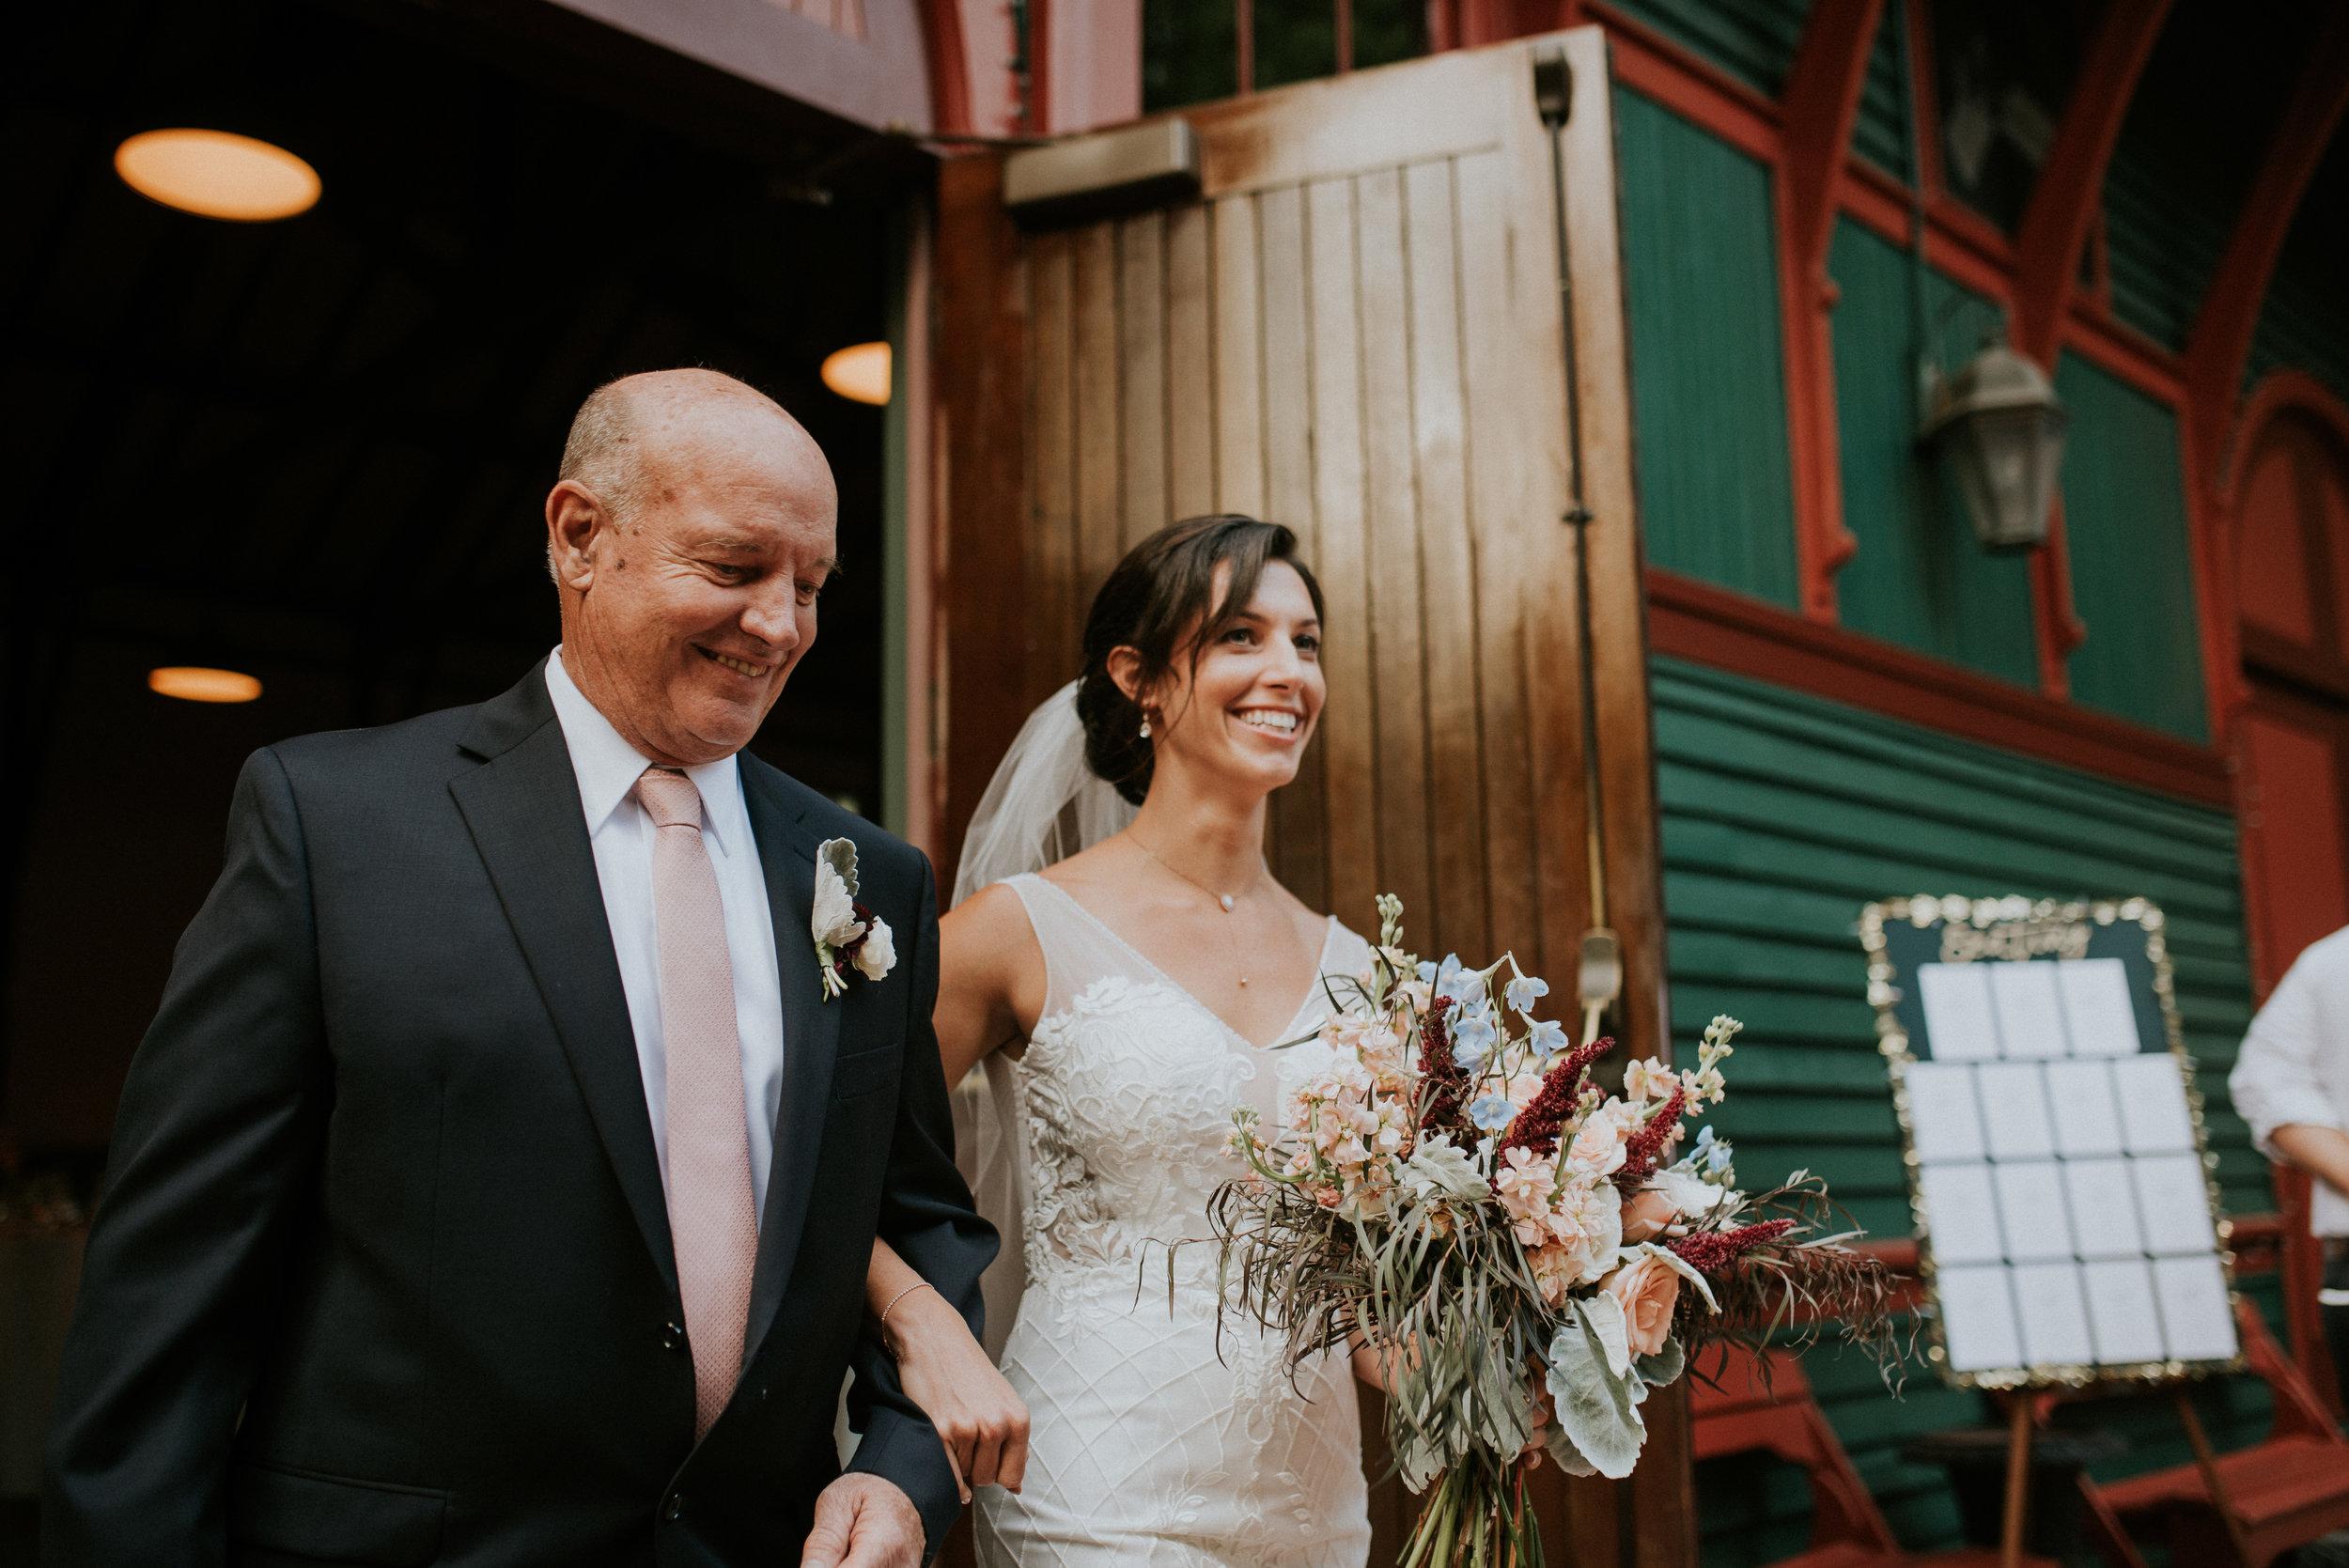 Bride walking down the aisle at The Trolley Barn in Atlanta, GA